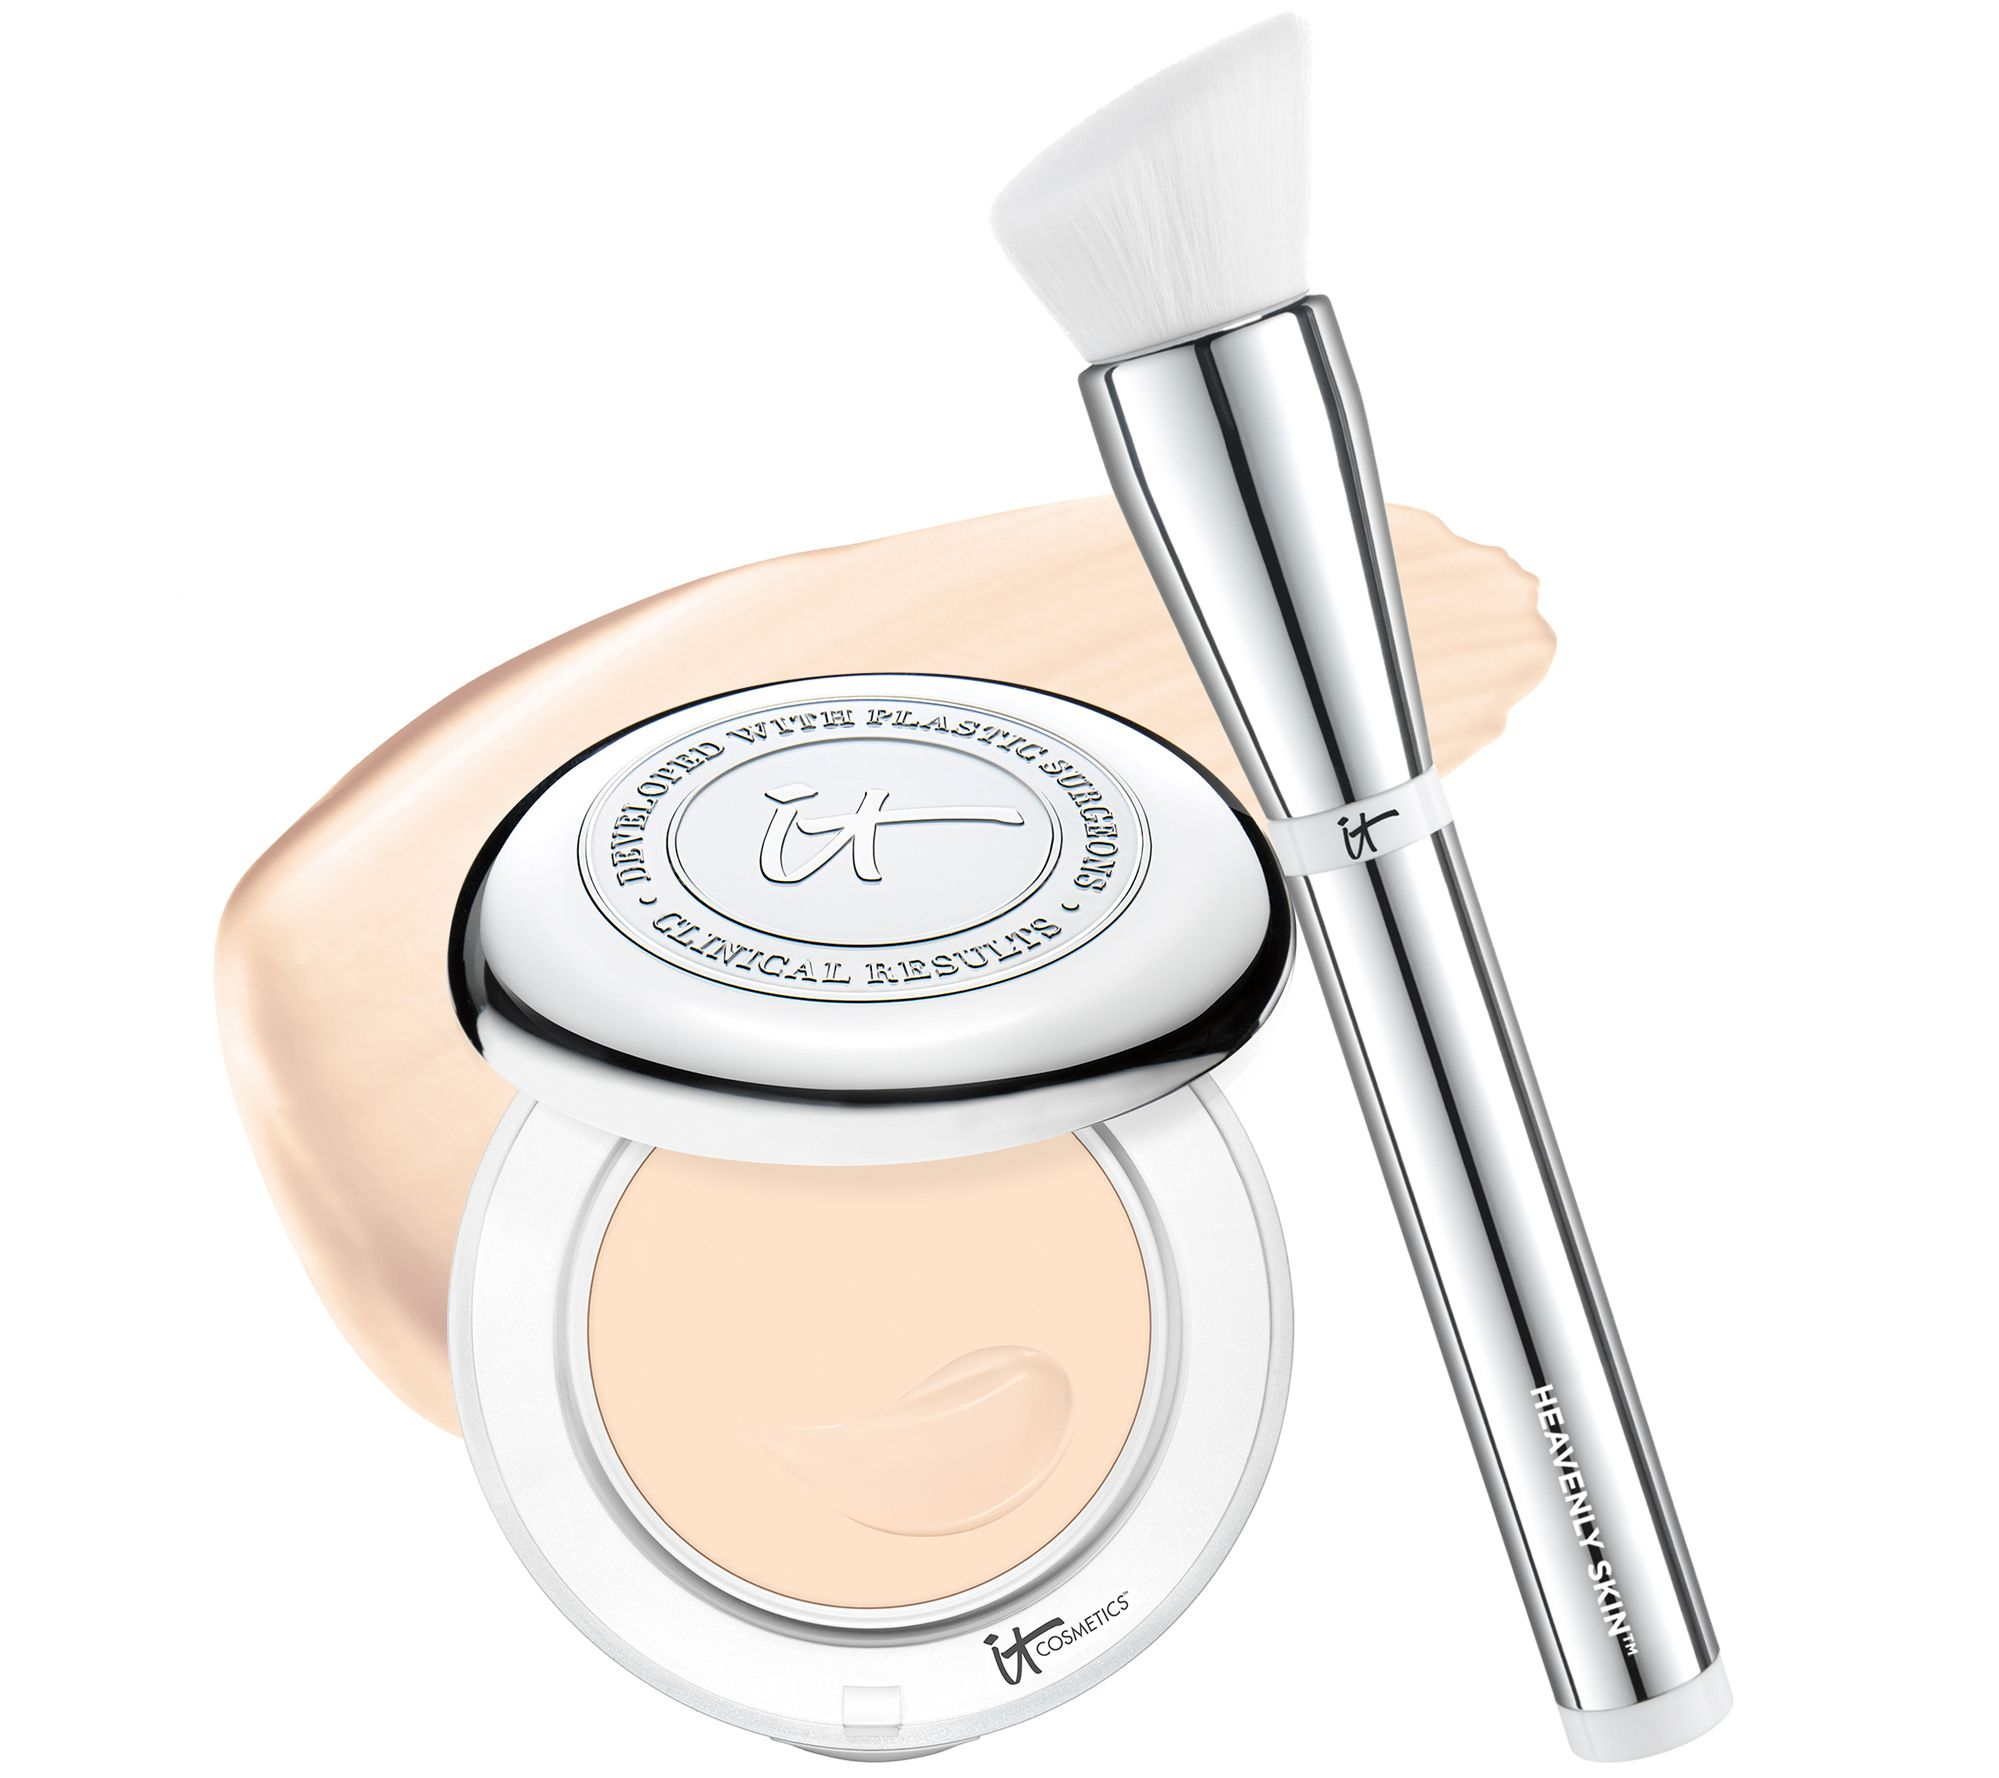 It Cosmetics x ULTA Airbrush Smoothing Foundation Brush #102 by IT Cosmetics #14